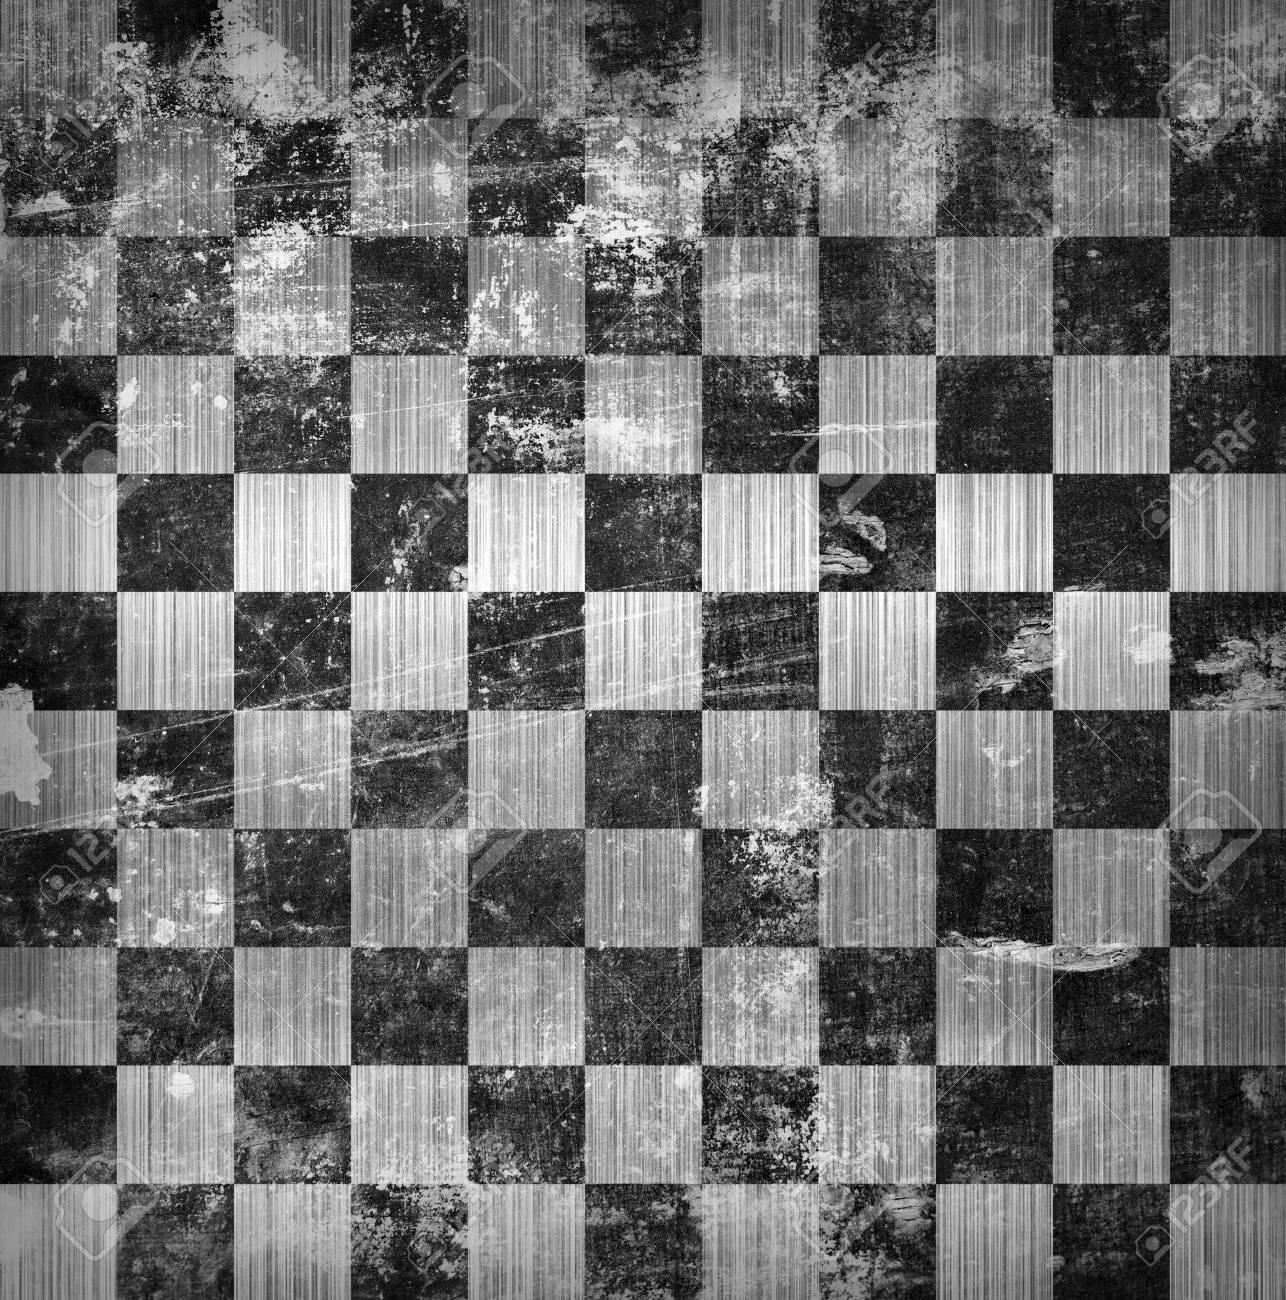 vivid grunge chessboard backgound Stock Photo - 18744351